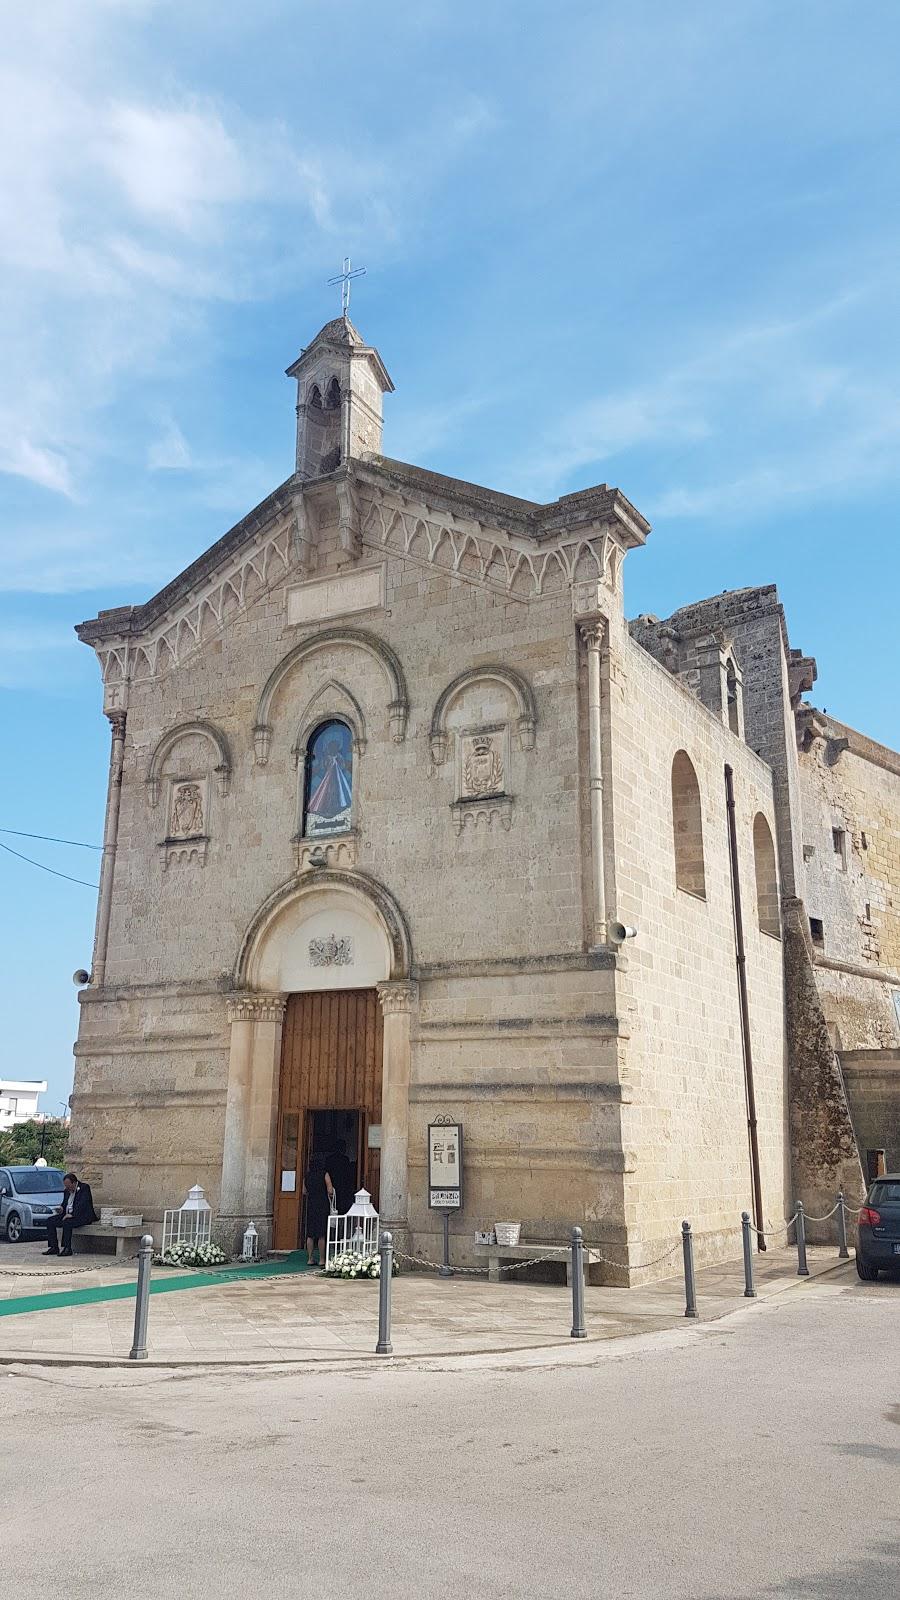 San Pietro in Bevagna